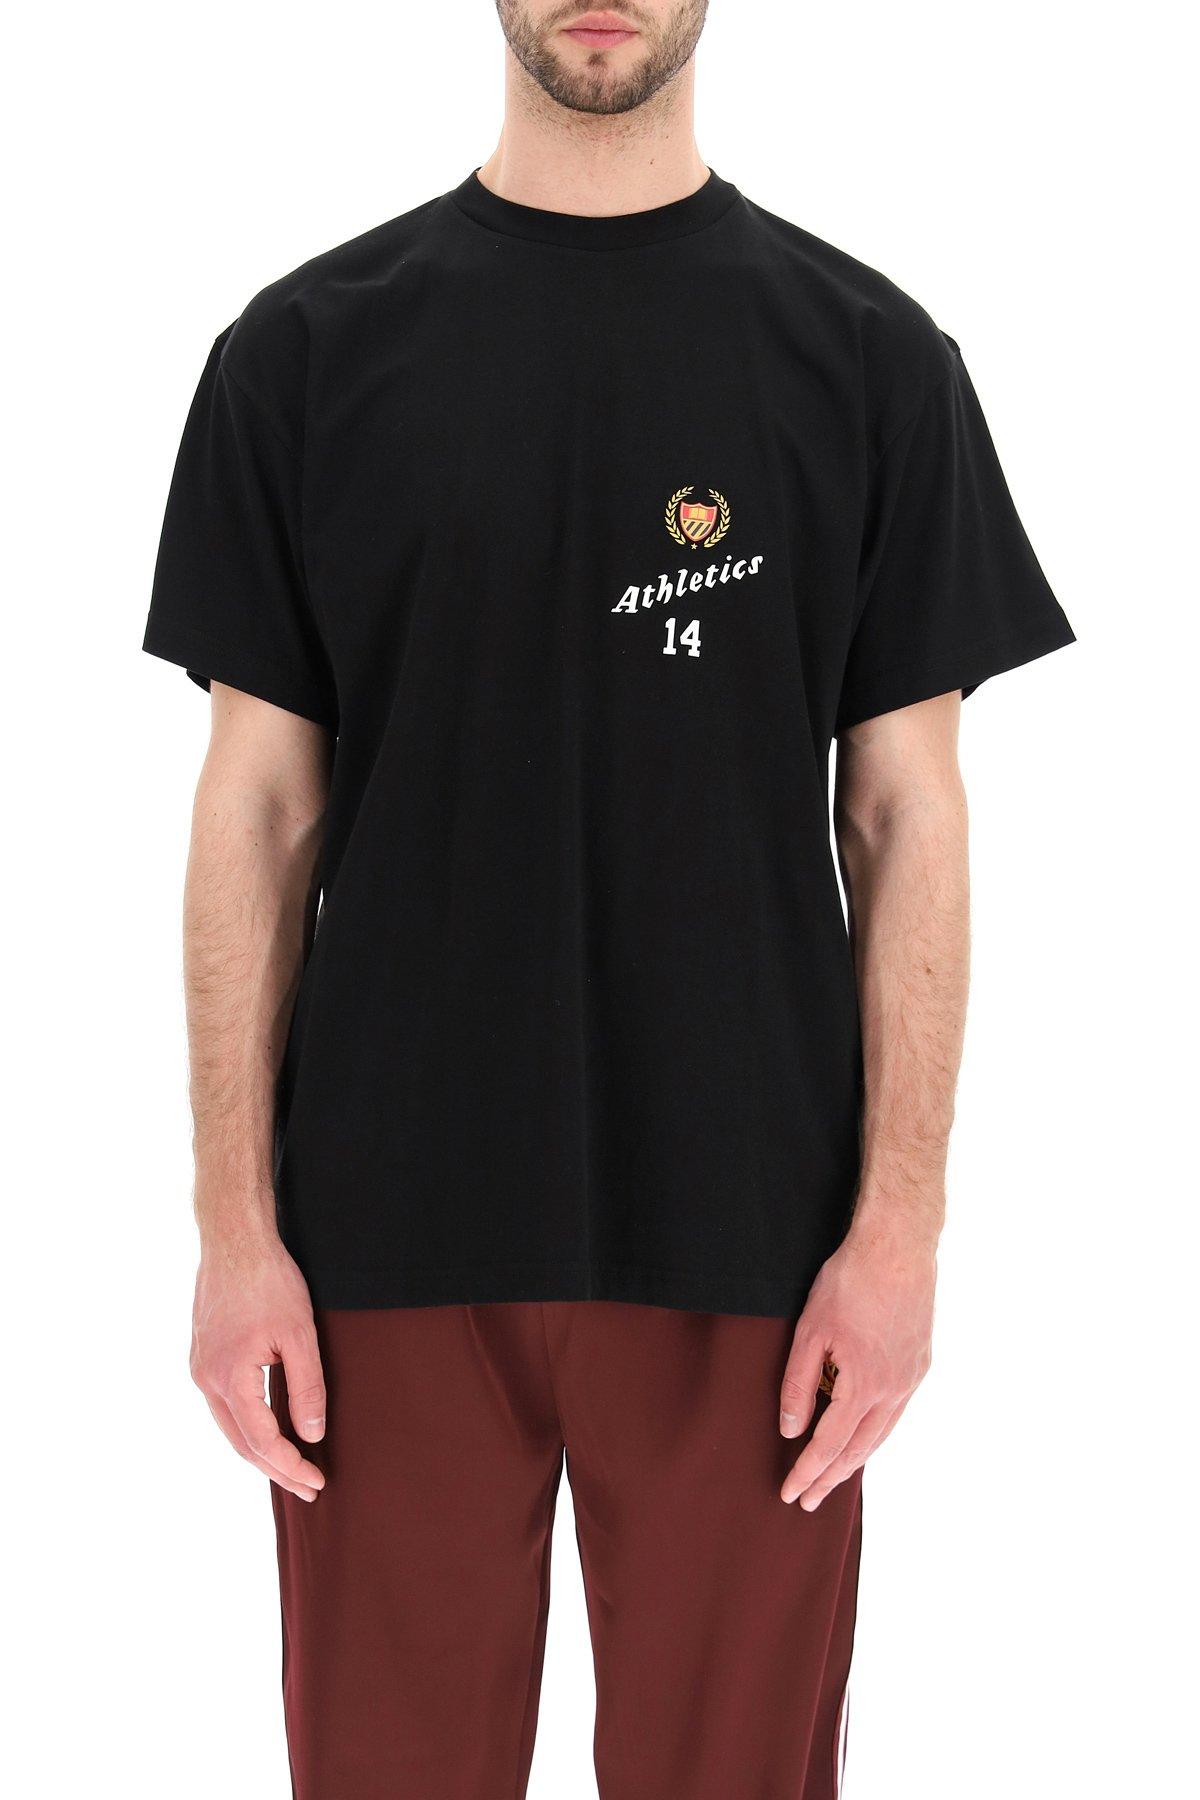 Bel-air athletics t-shirt graphic tee